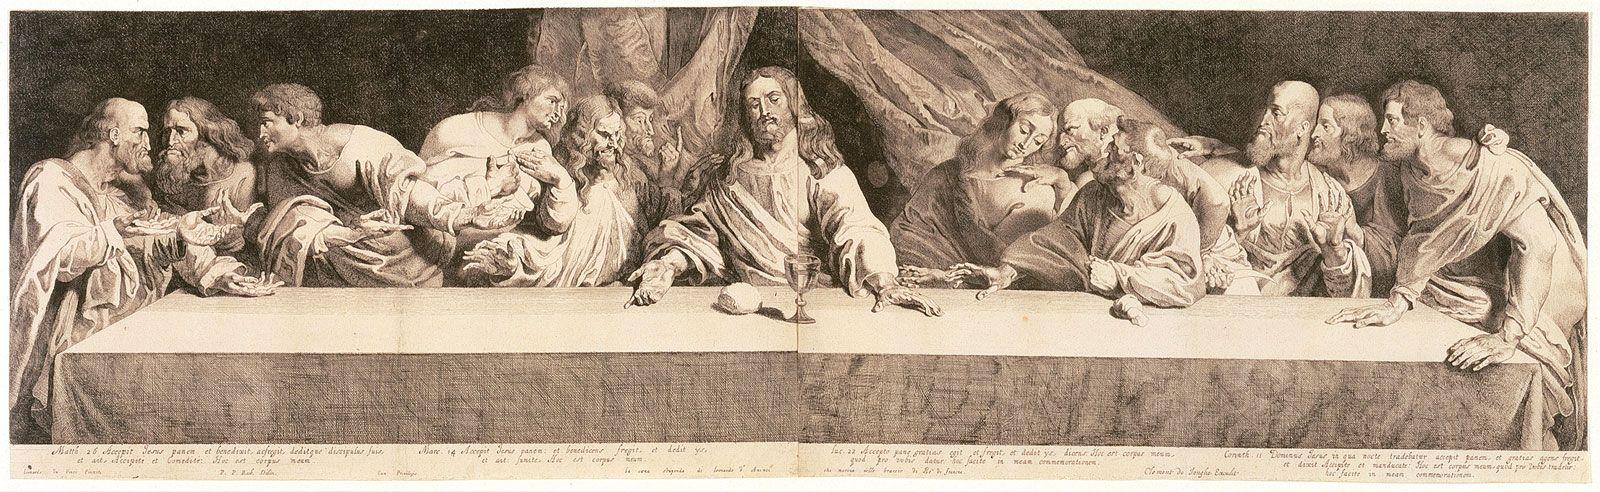 Pieter Claesz Soutman's Last Supper, after Peter Paul Rubens, after Leonardo da Vinci (1620-30)